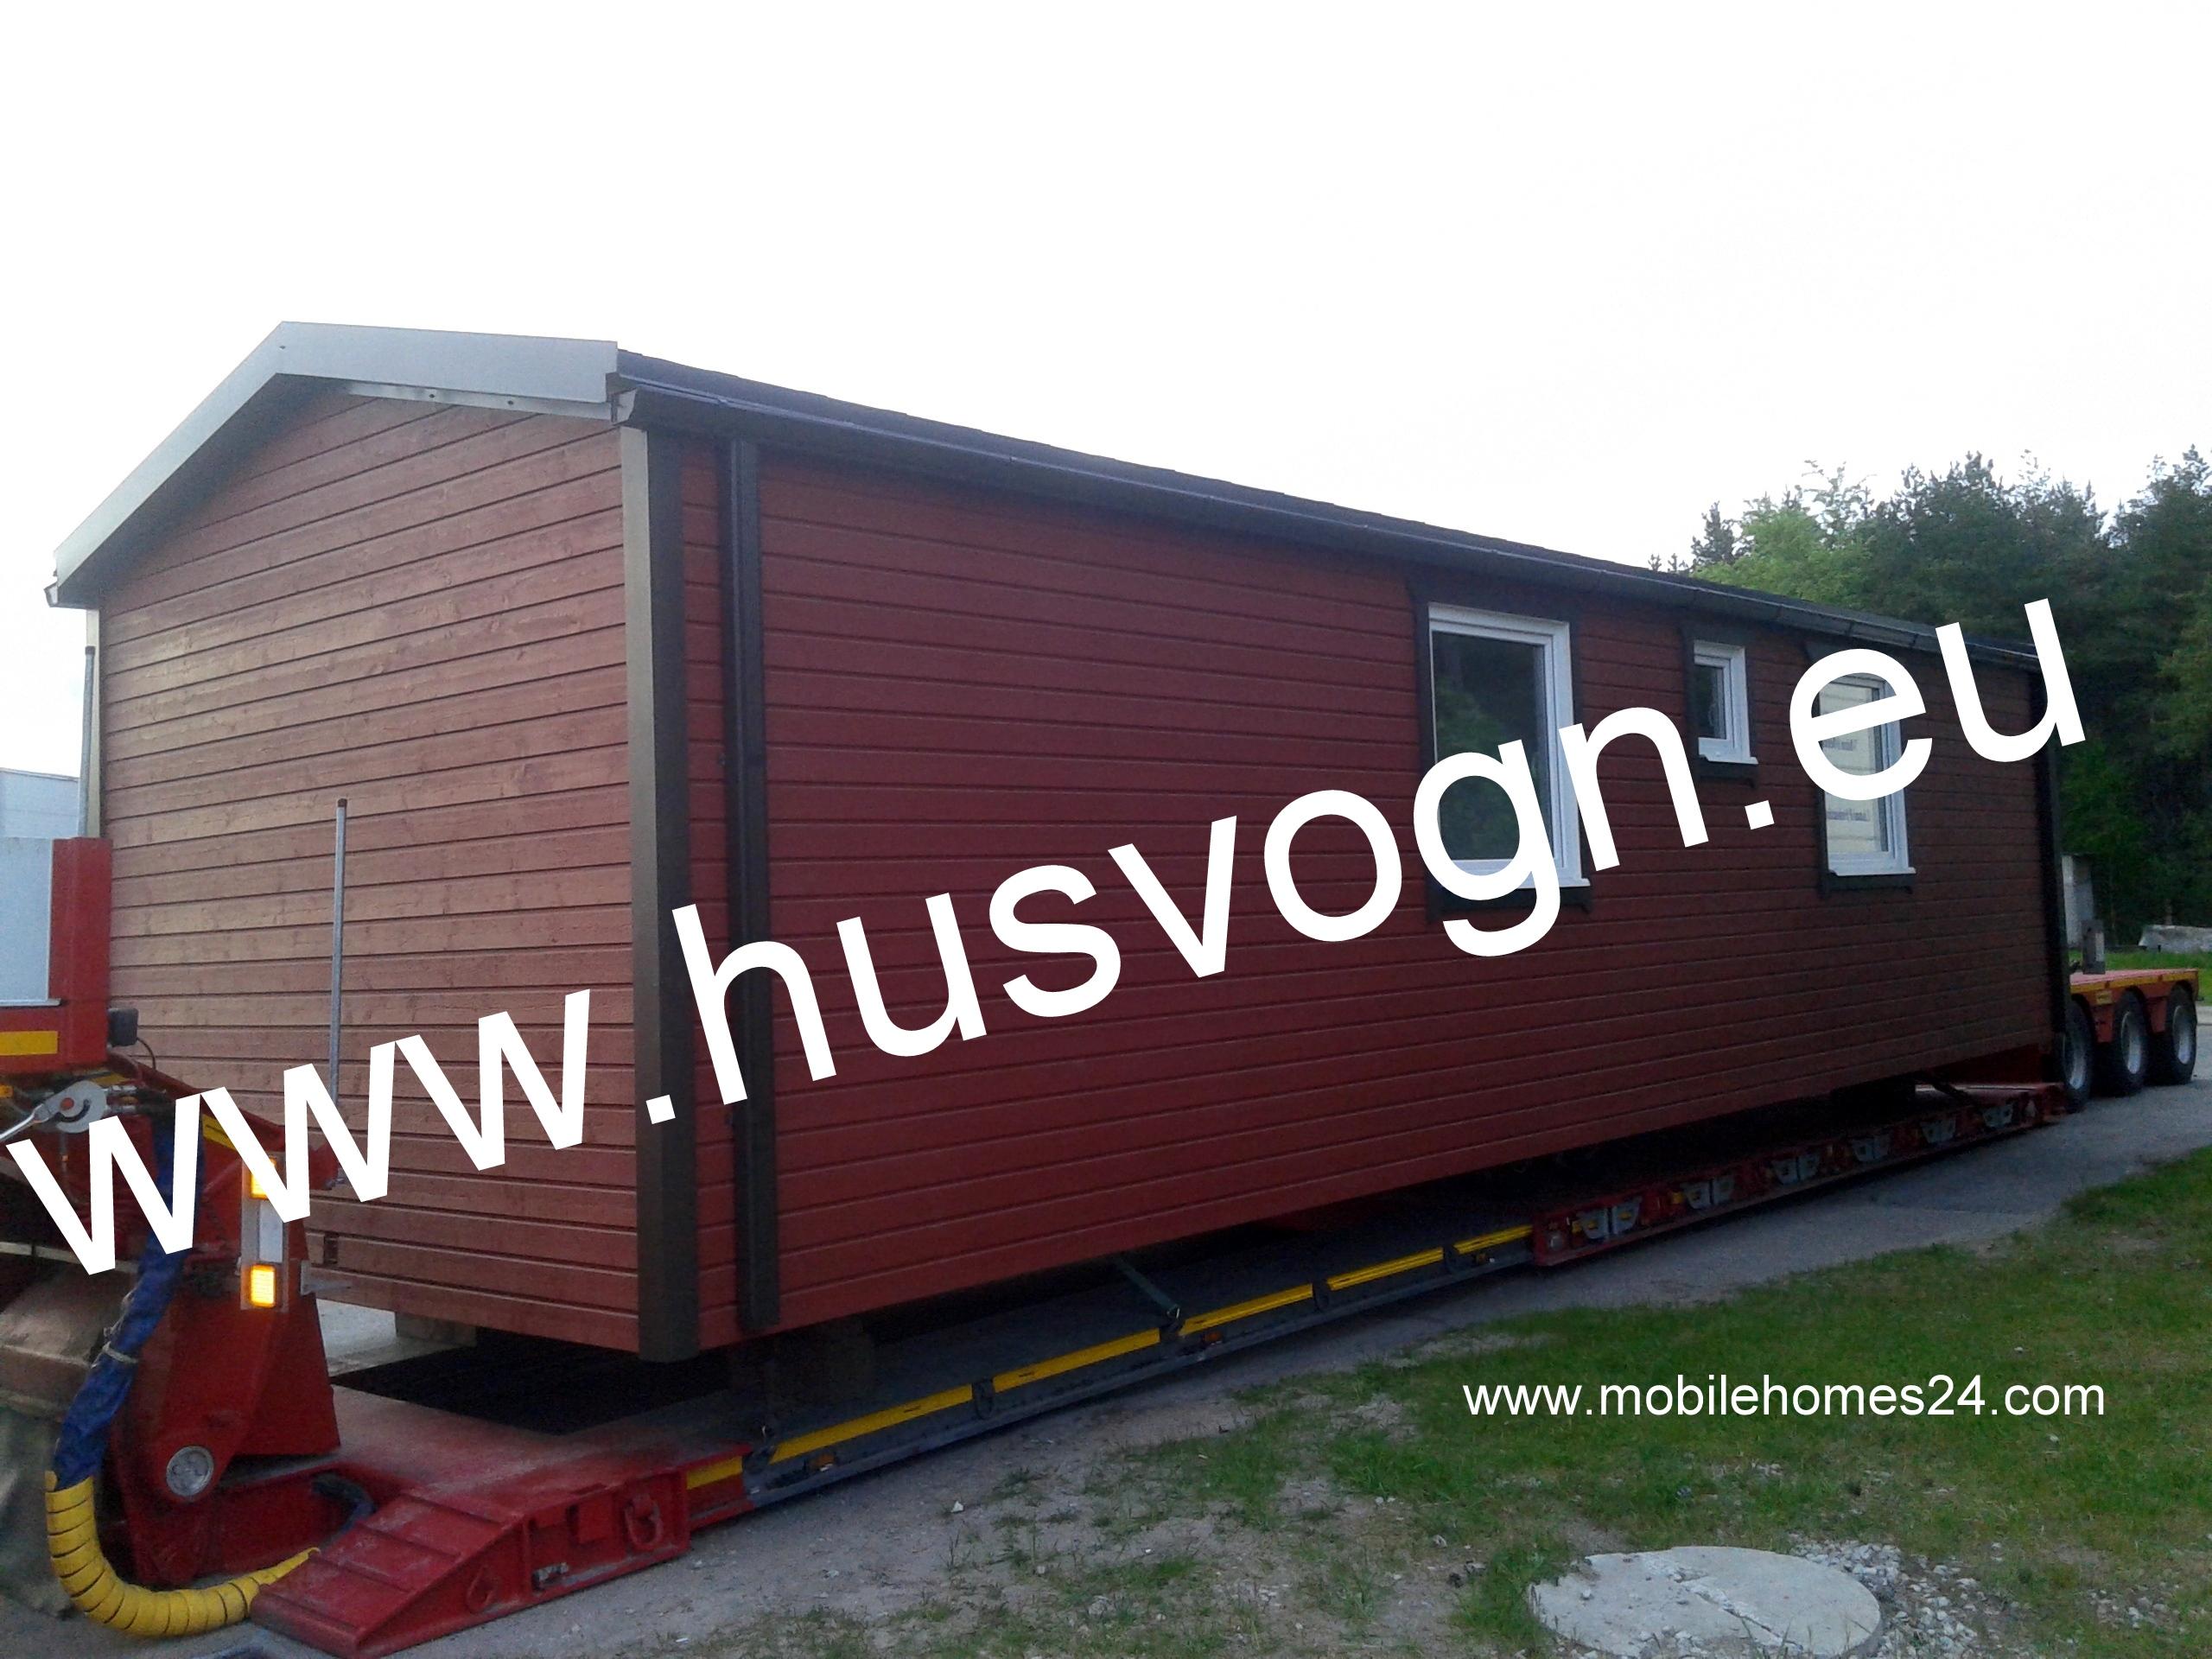 Husvogn, husvogner, husvogner til salgs, Estland mobile homes, static caravan